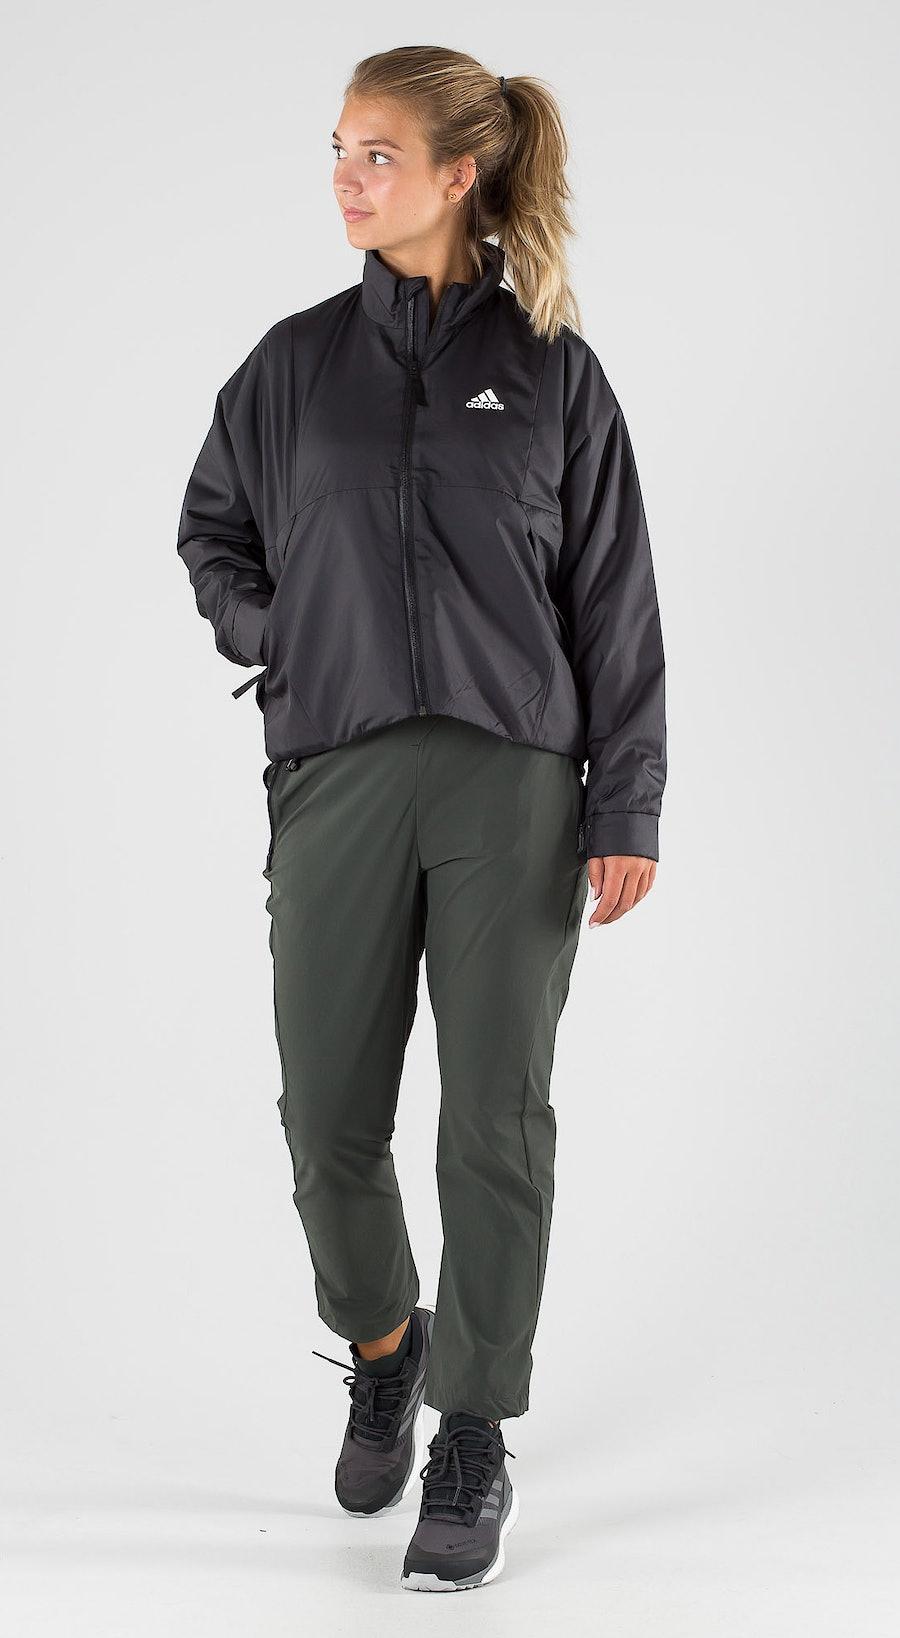 Adidas Terrex BTS Light Black/White Outfit Multi